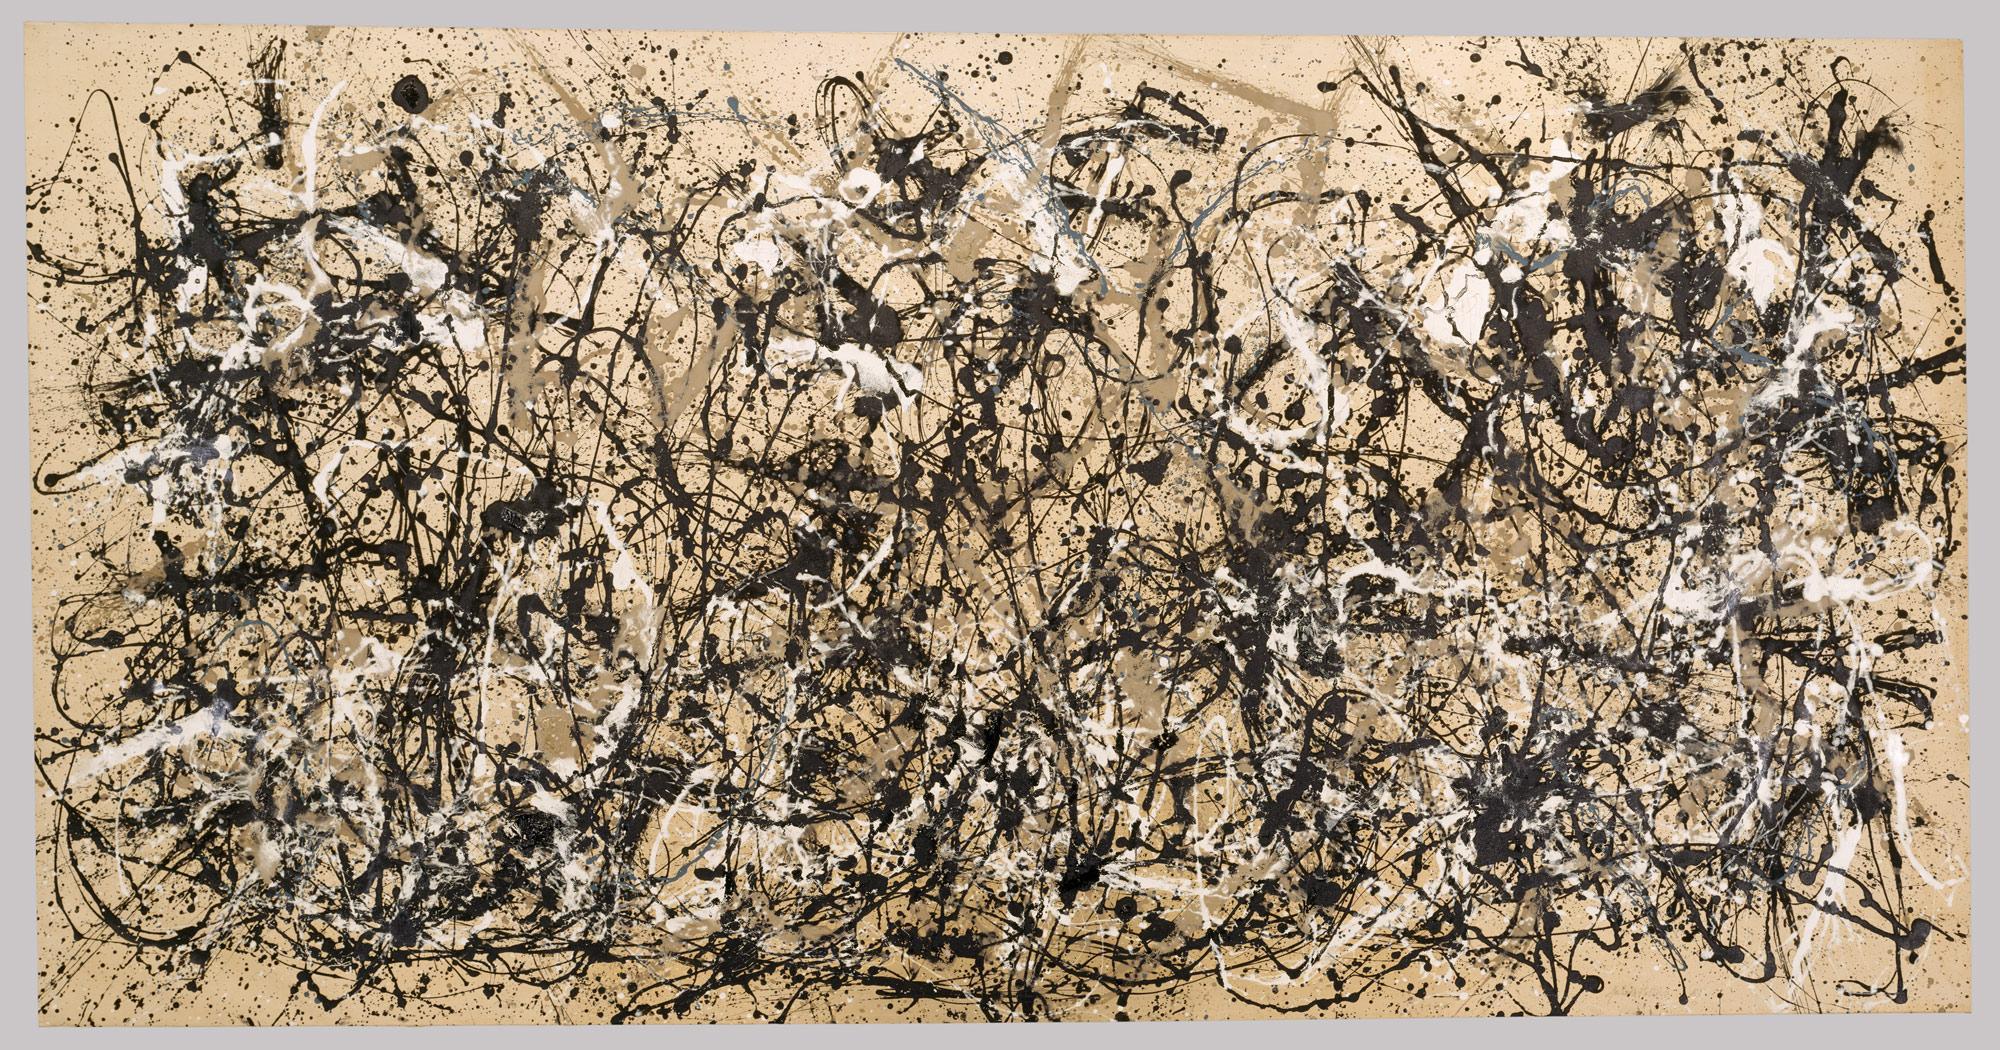 Jackson Pollock's Autumn Rhythm (Number 30) (1950) at the Metropolitan Museum of Art, New York